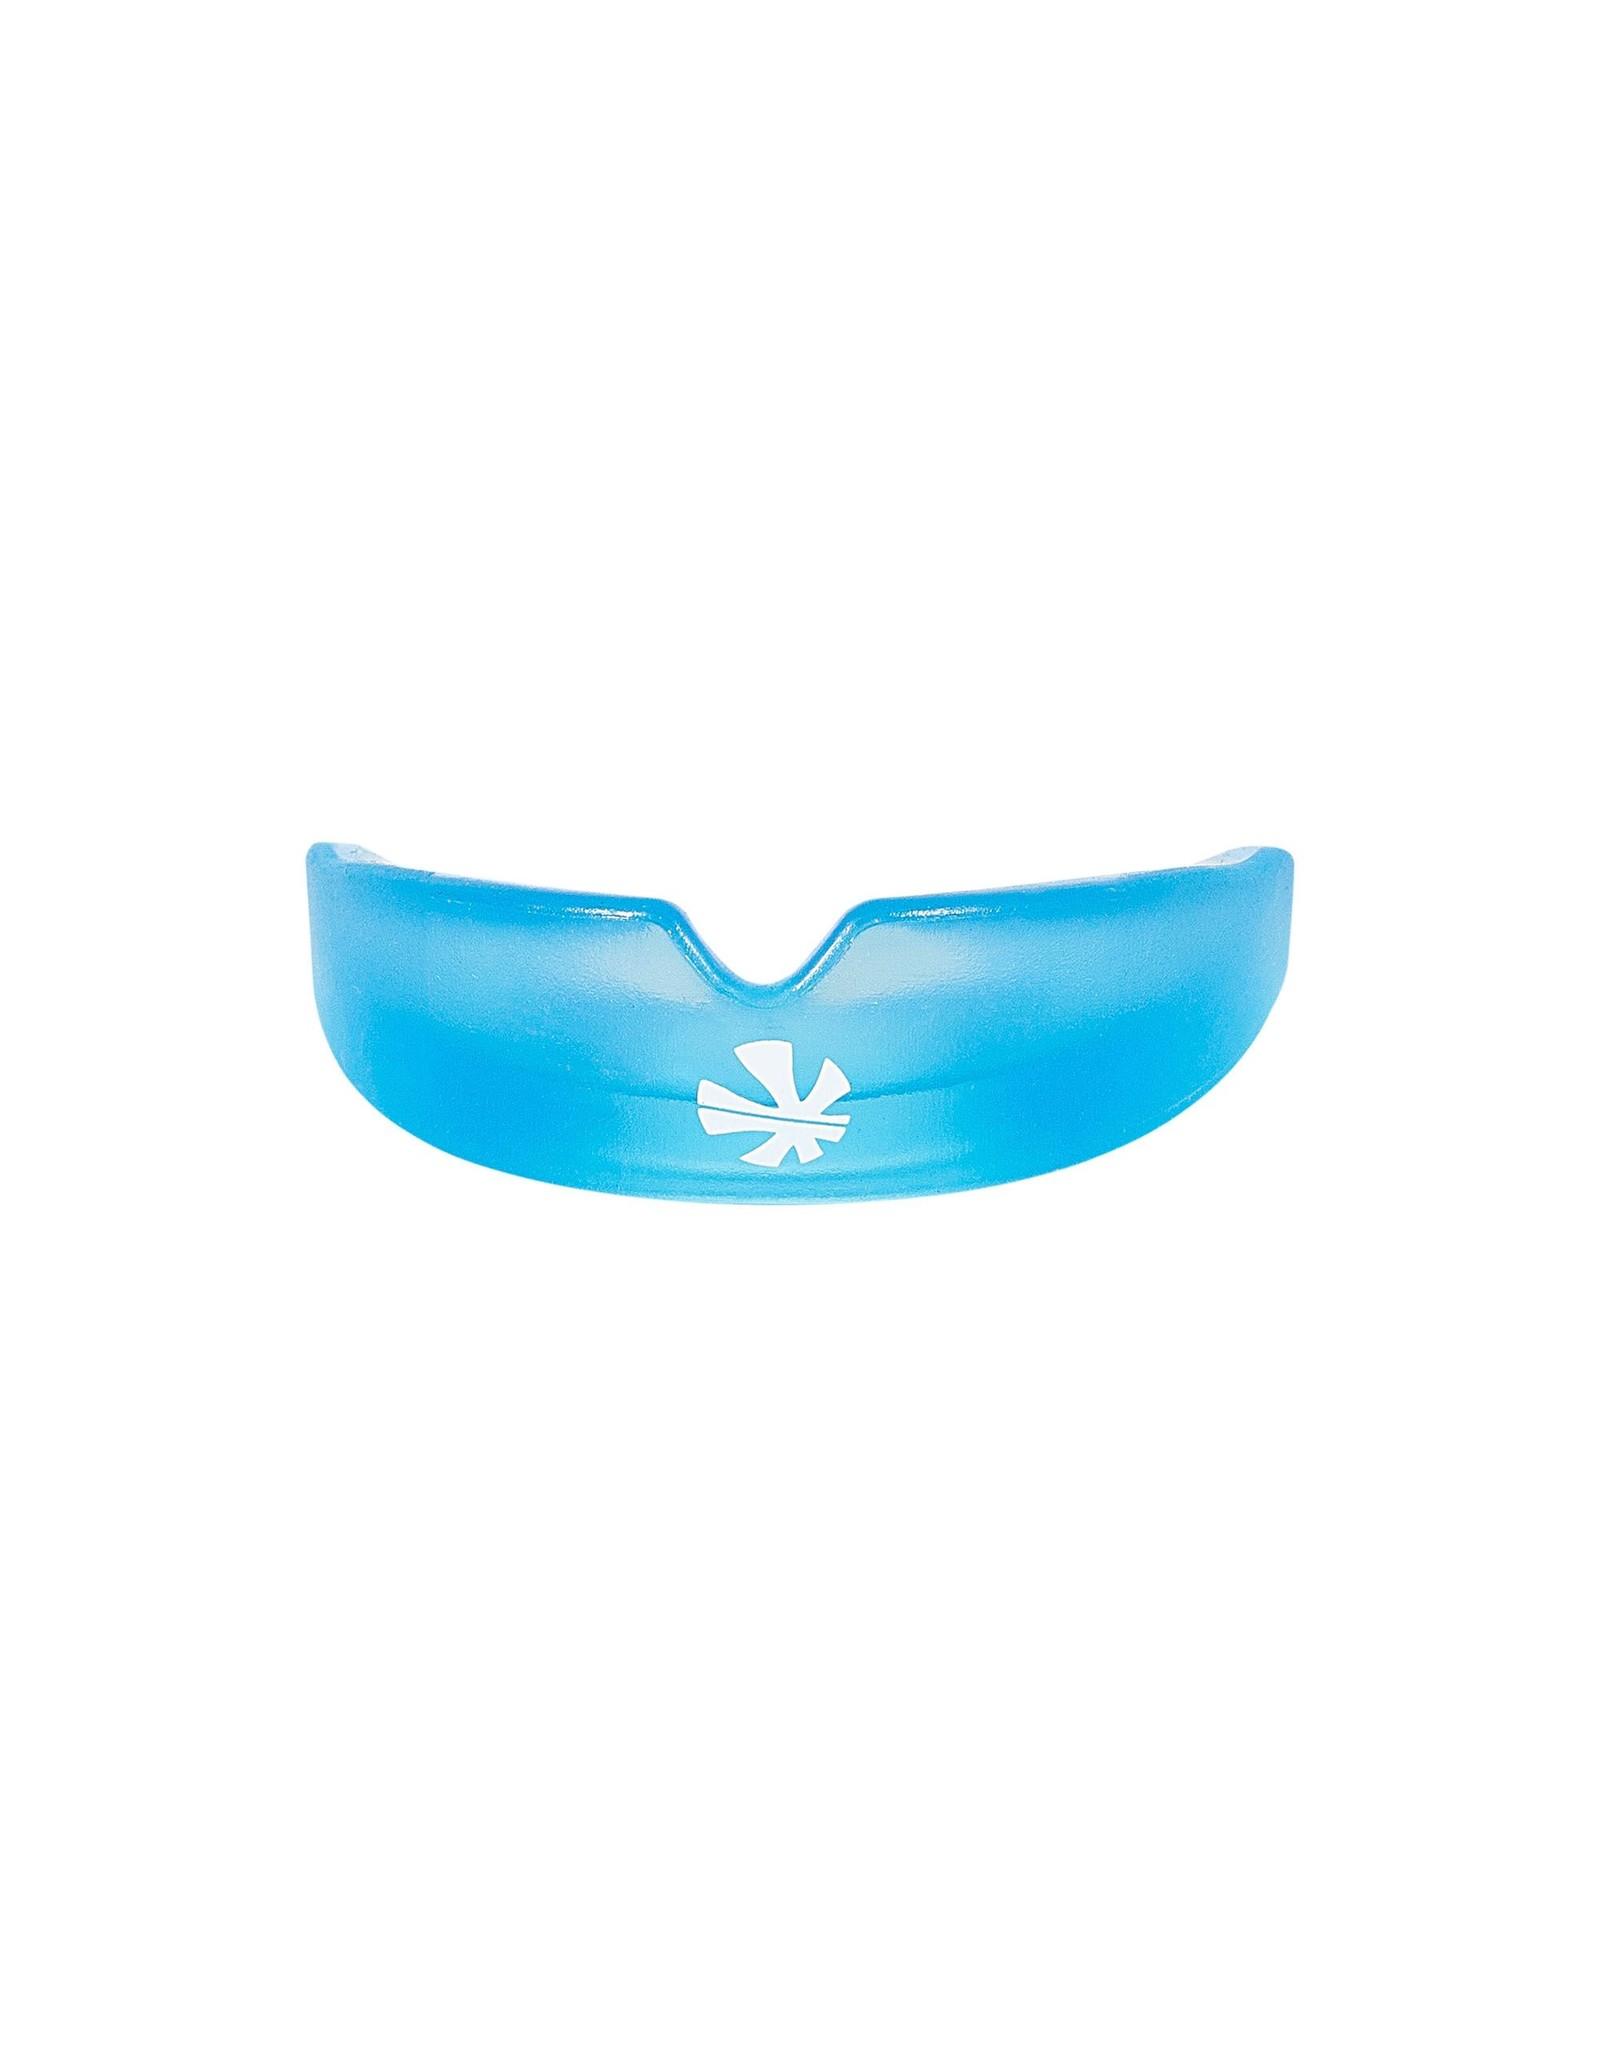 Reece Australia Ultra Safe Mouthguard-Blauw